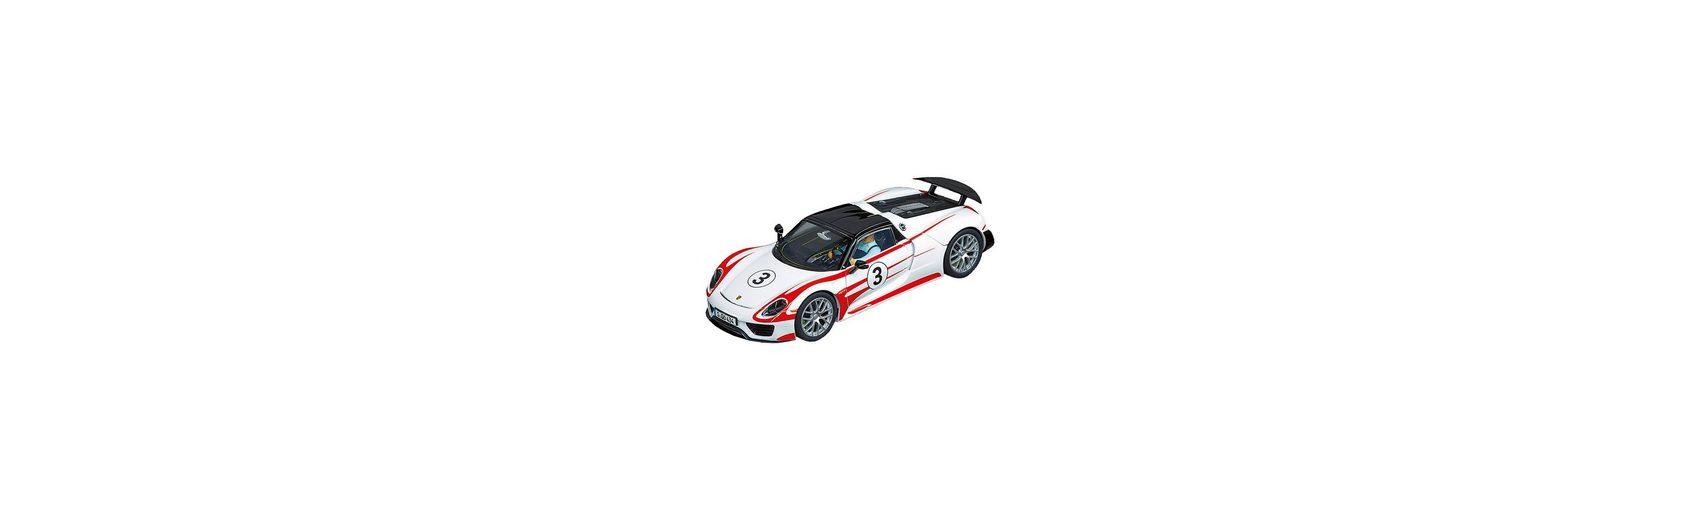 "Carrera Digital 132 30711 Porsche 918 Spyder, ""No.03"""